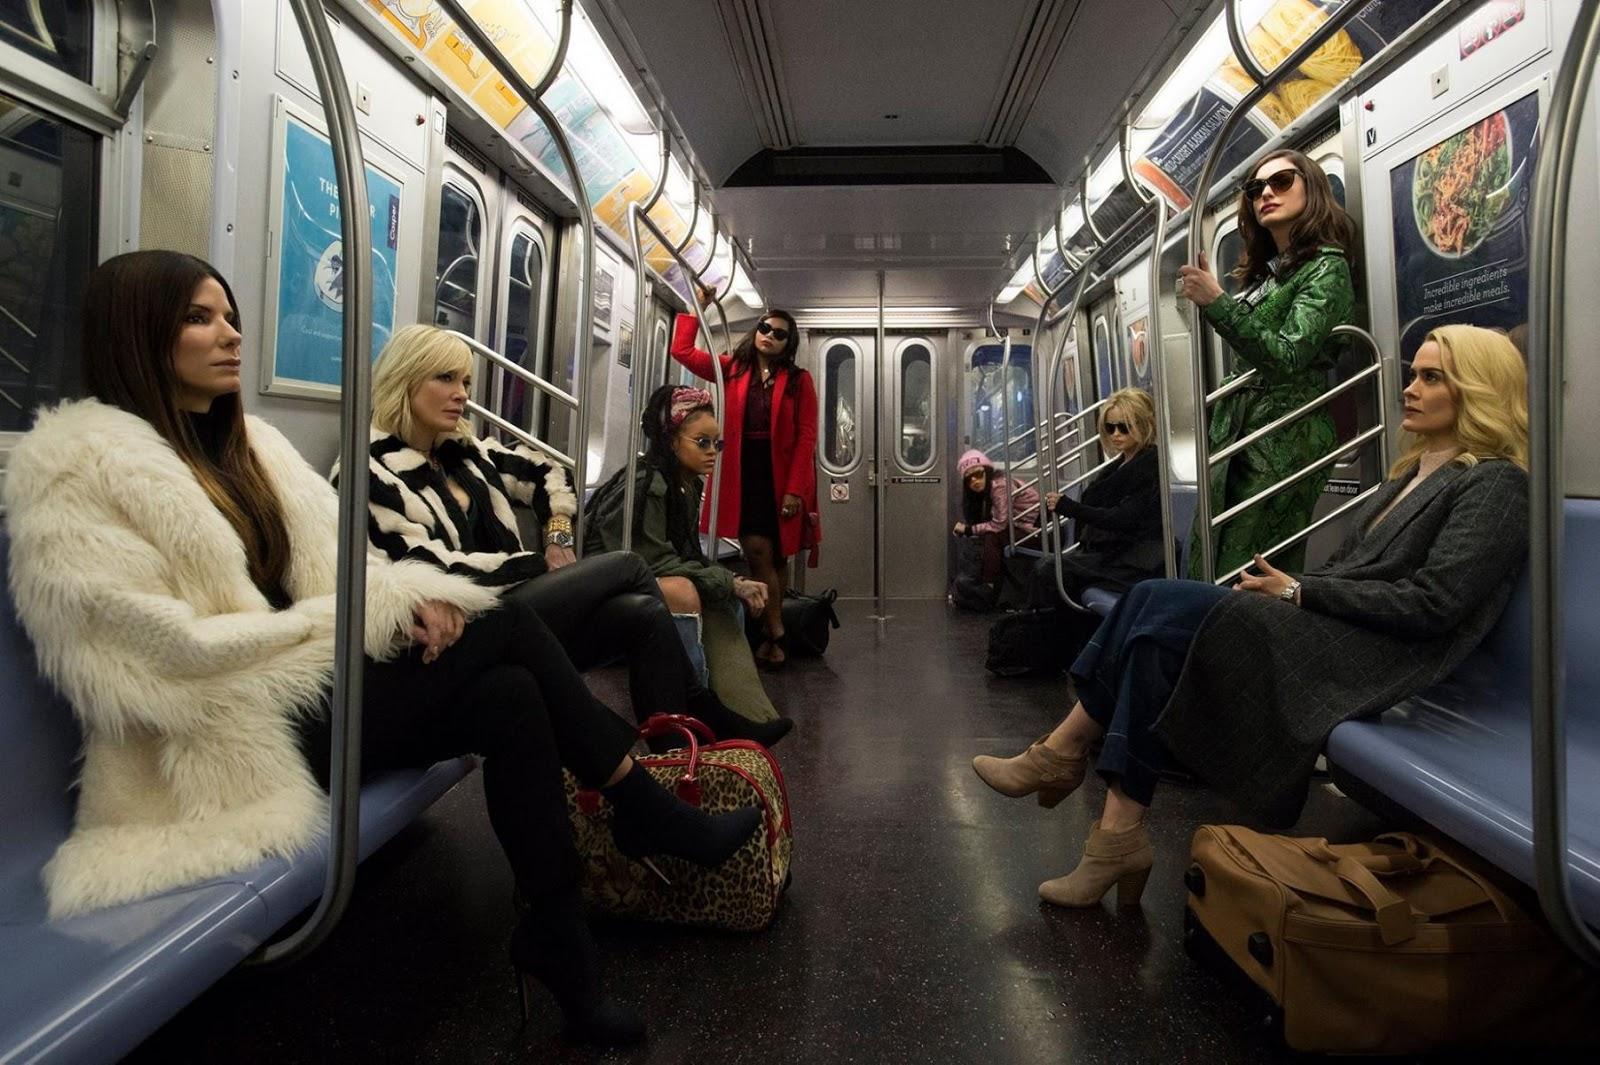 OCEAN'S 8  - reparto pelicula -  Sandra Bullock, Cate Blanchett, Anne Hathaway, Helena Bonham Carter, Mindy Kaling, Rihanna, Awkwafina, Sarah Paulson